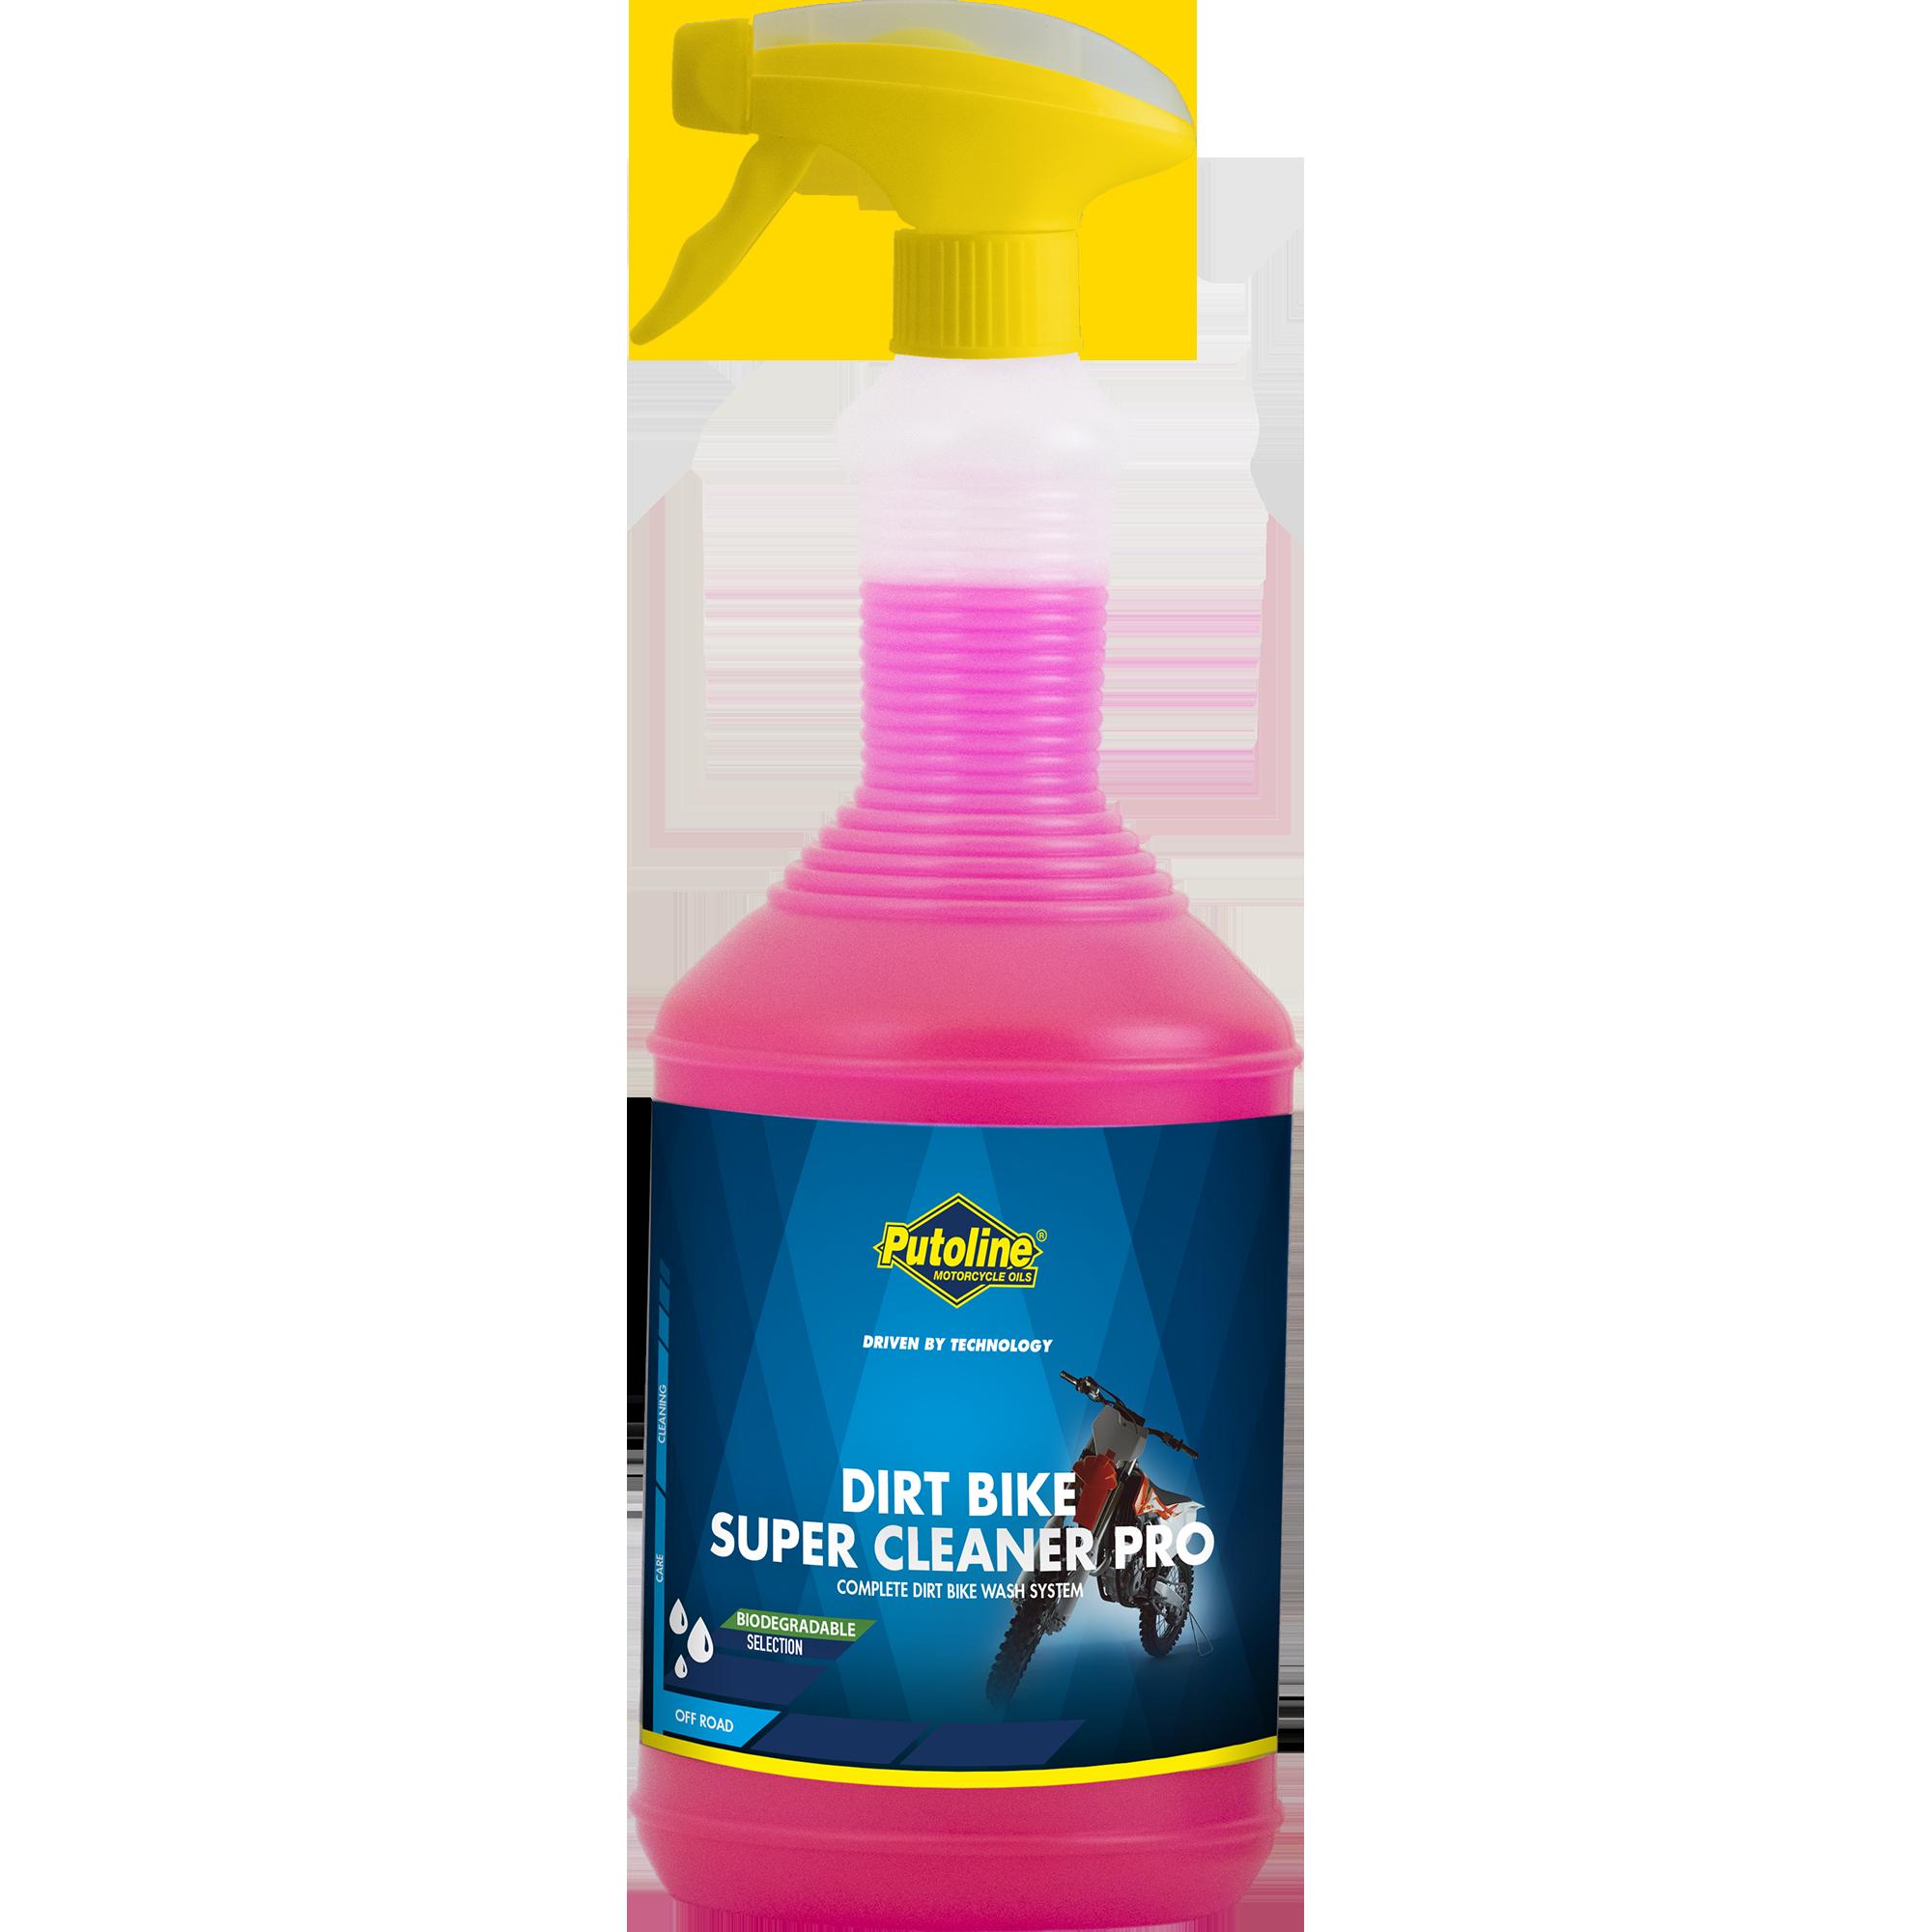 Putoline Dirt Bike Super Cleaner 1L